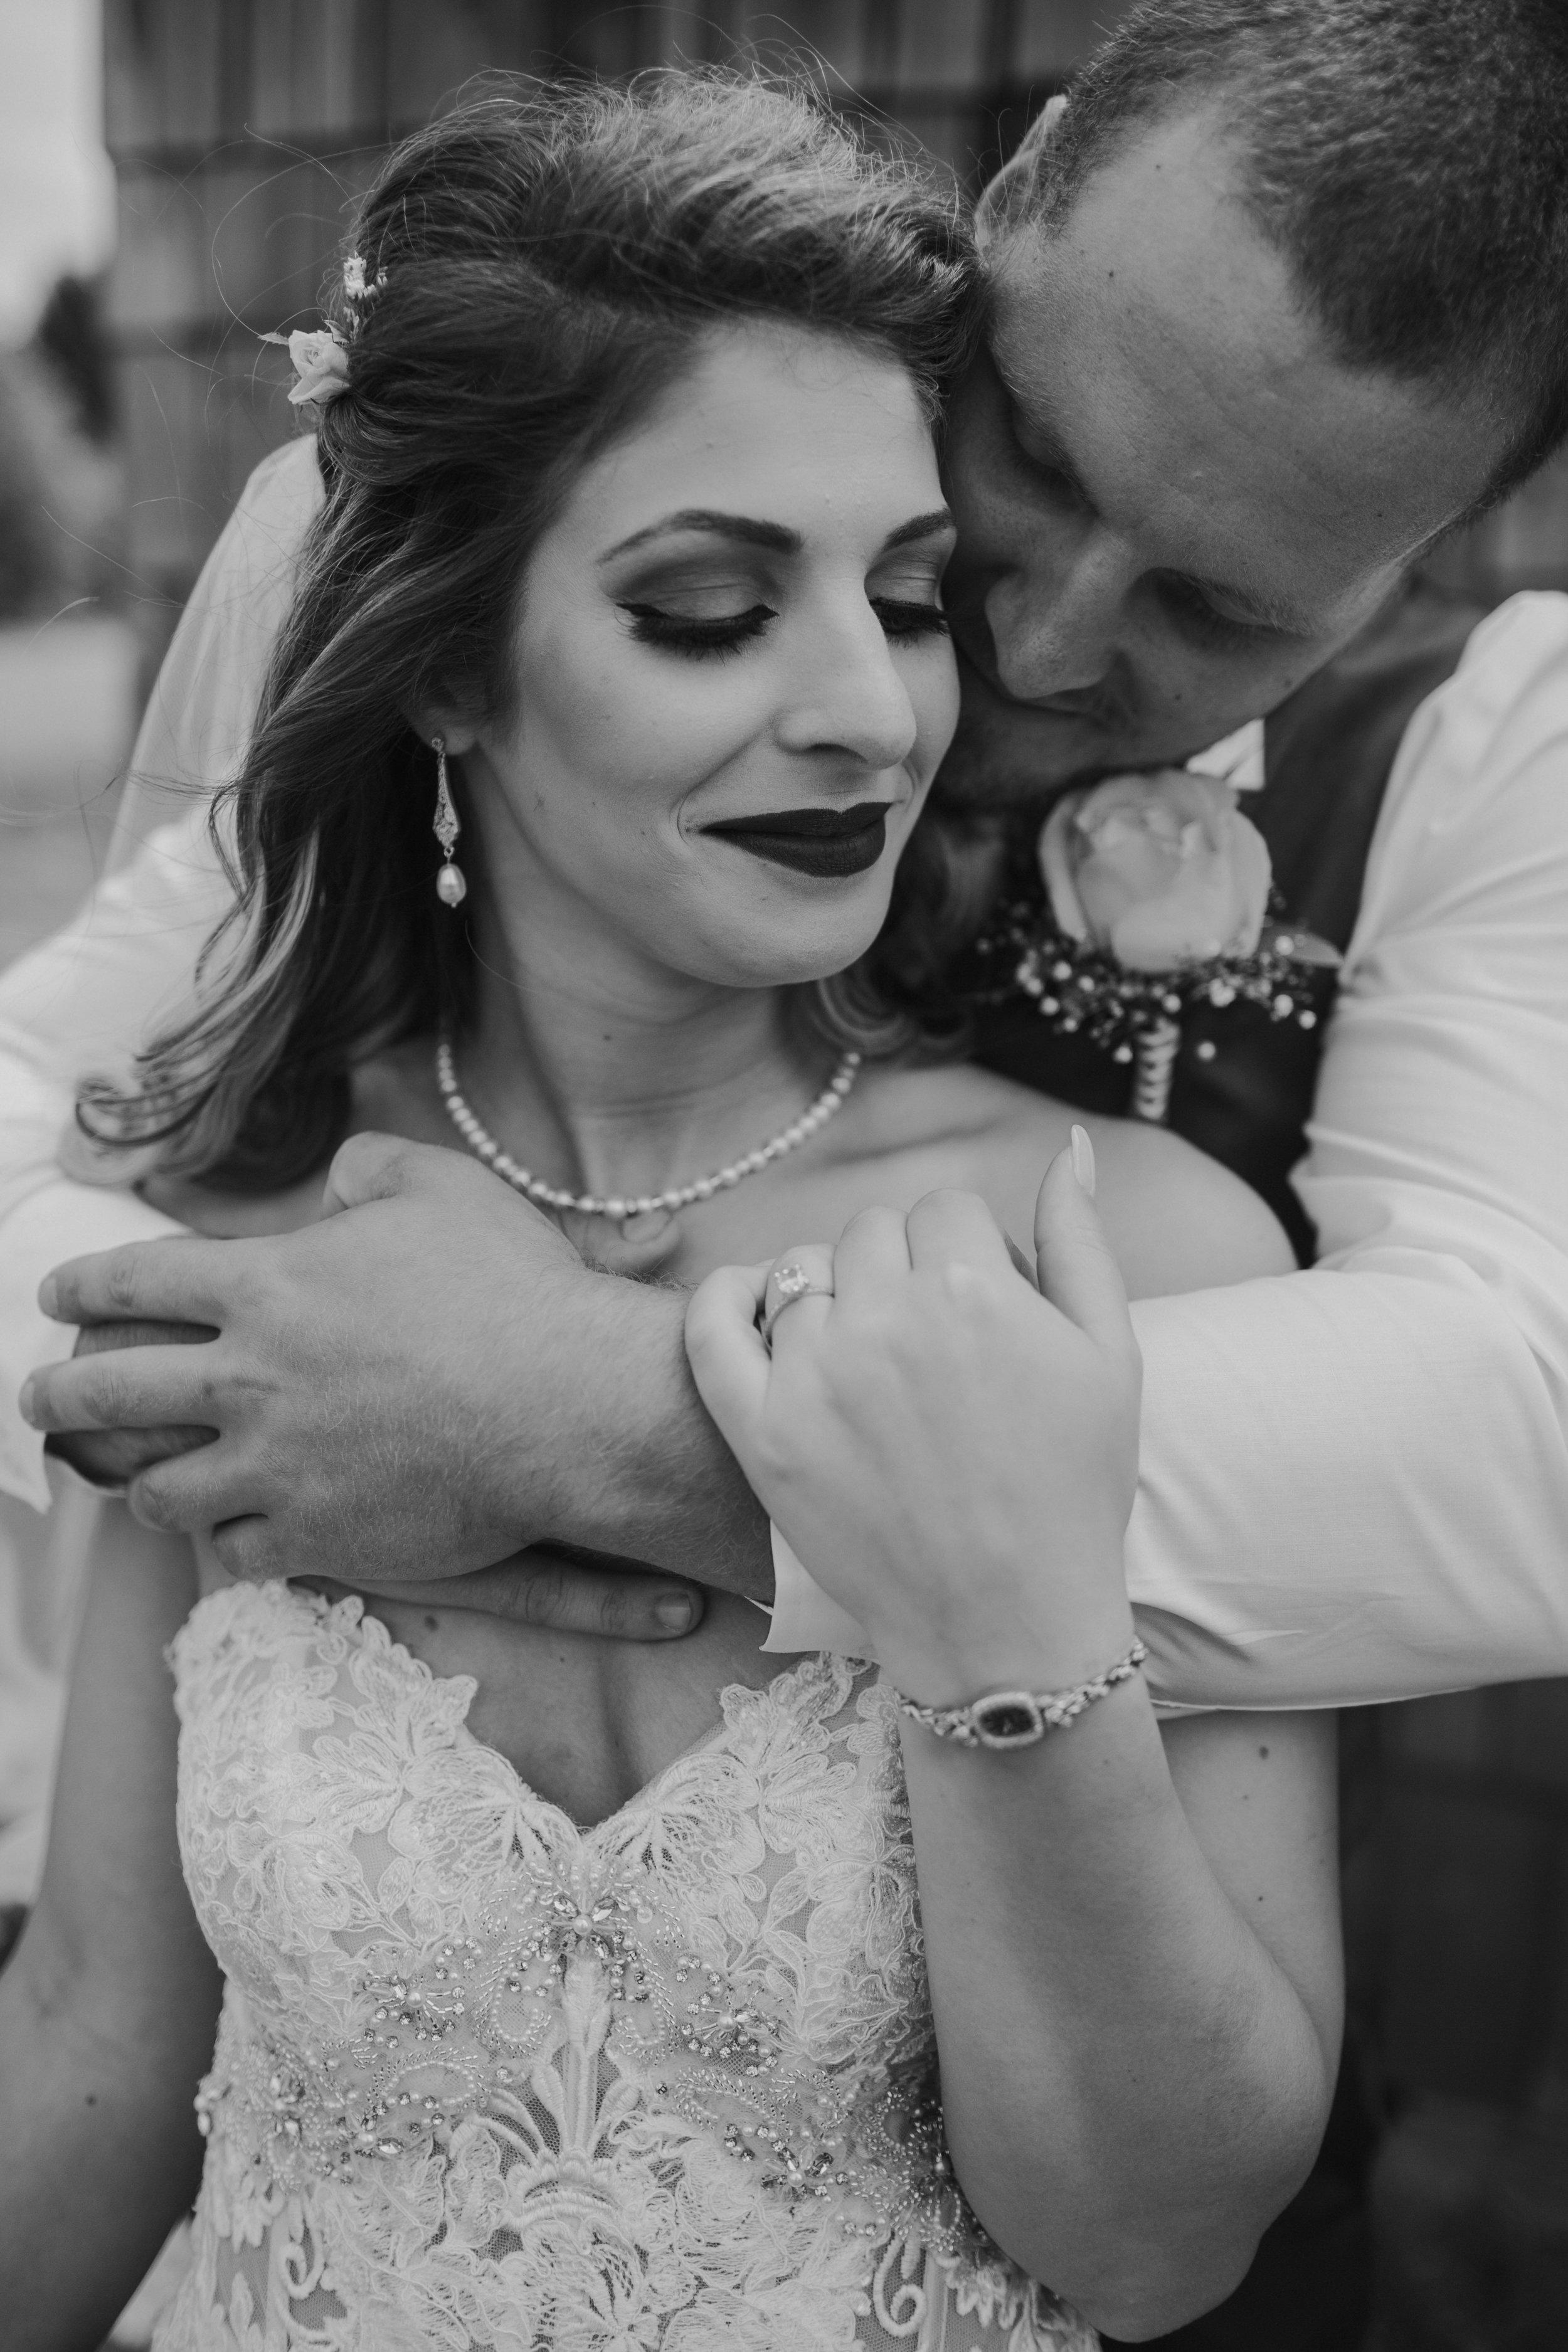 Olympic-Peninsula-Wedding-Photographer-PNW-Forks-Port-Angeles-Kayla-Dawn-Photography-engagement-Olympic-National-Park-133.jpg